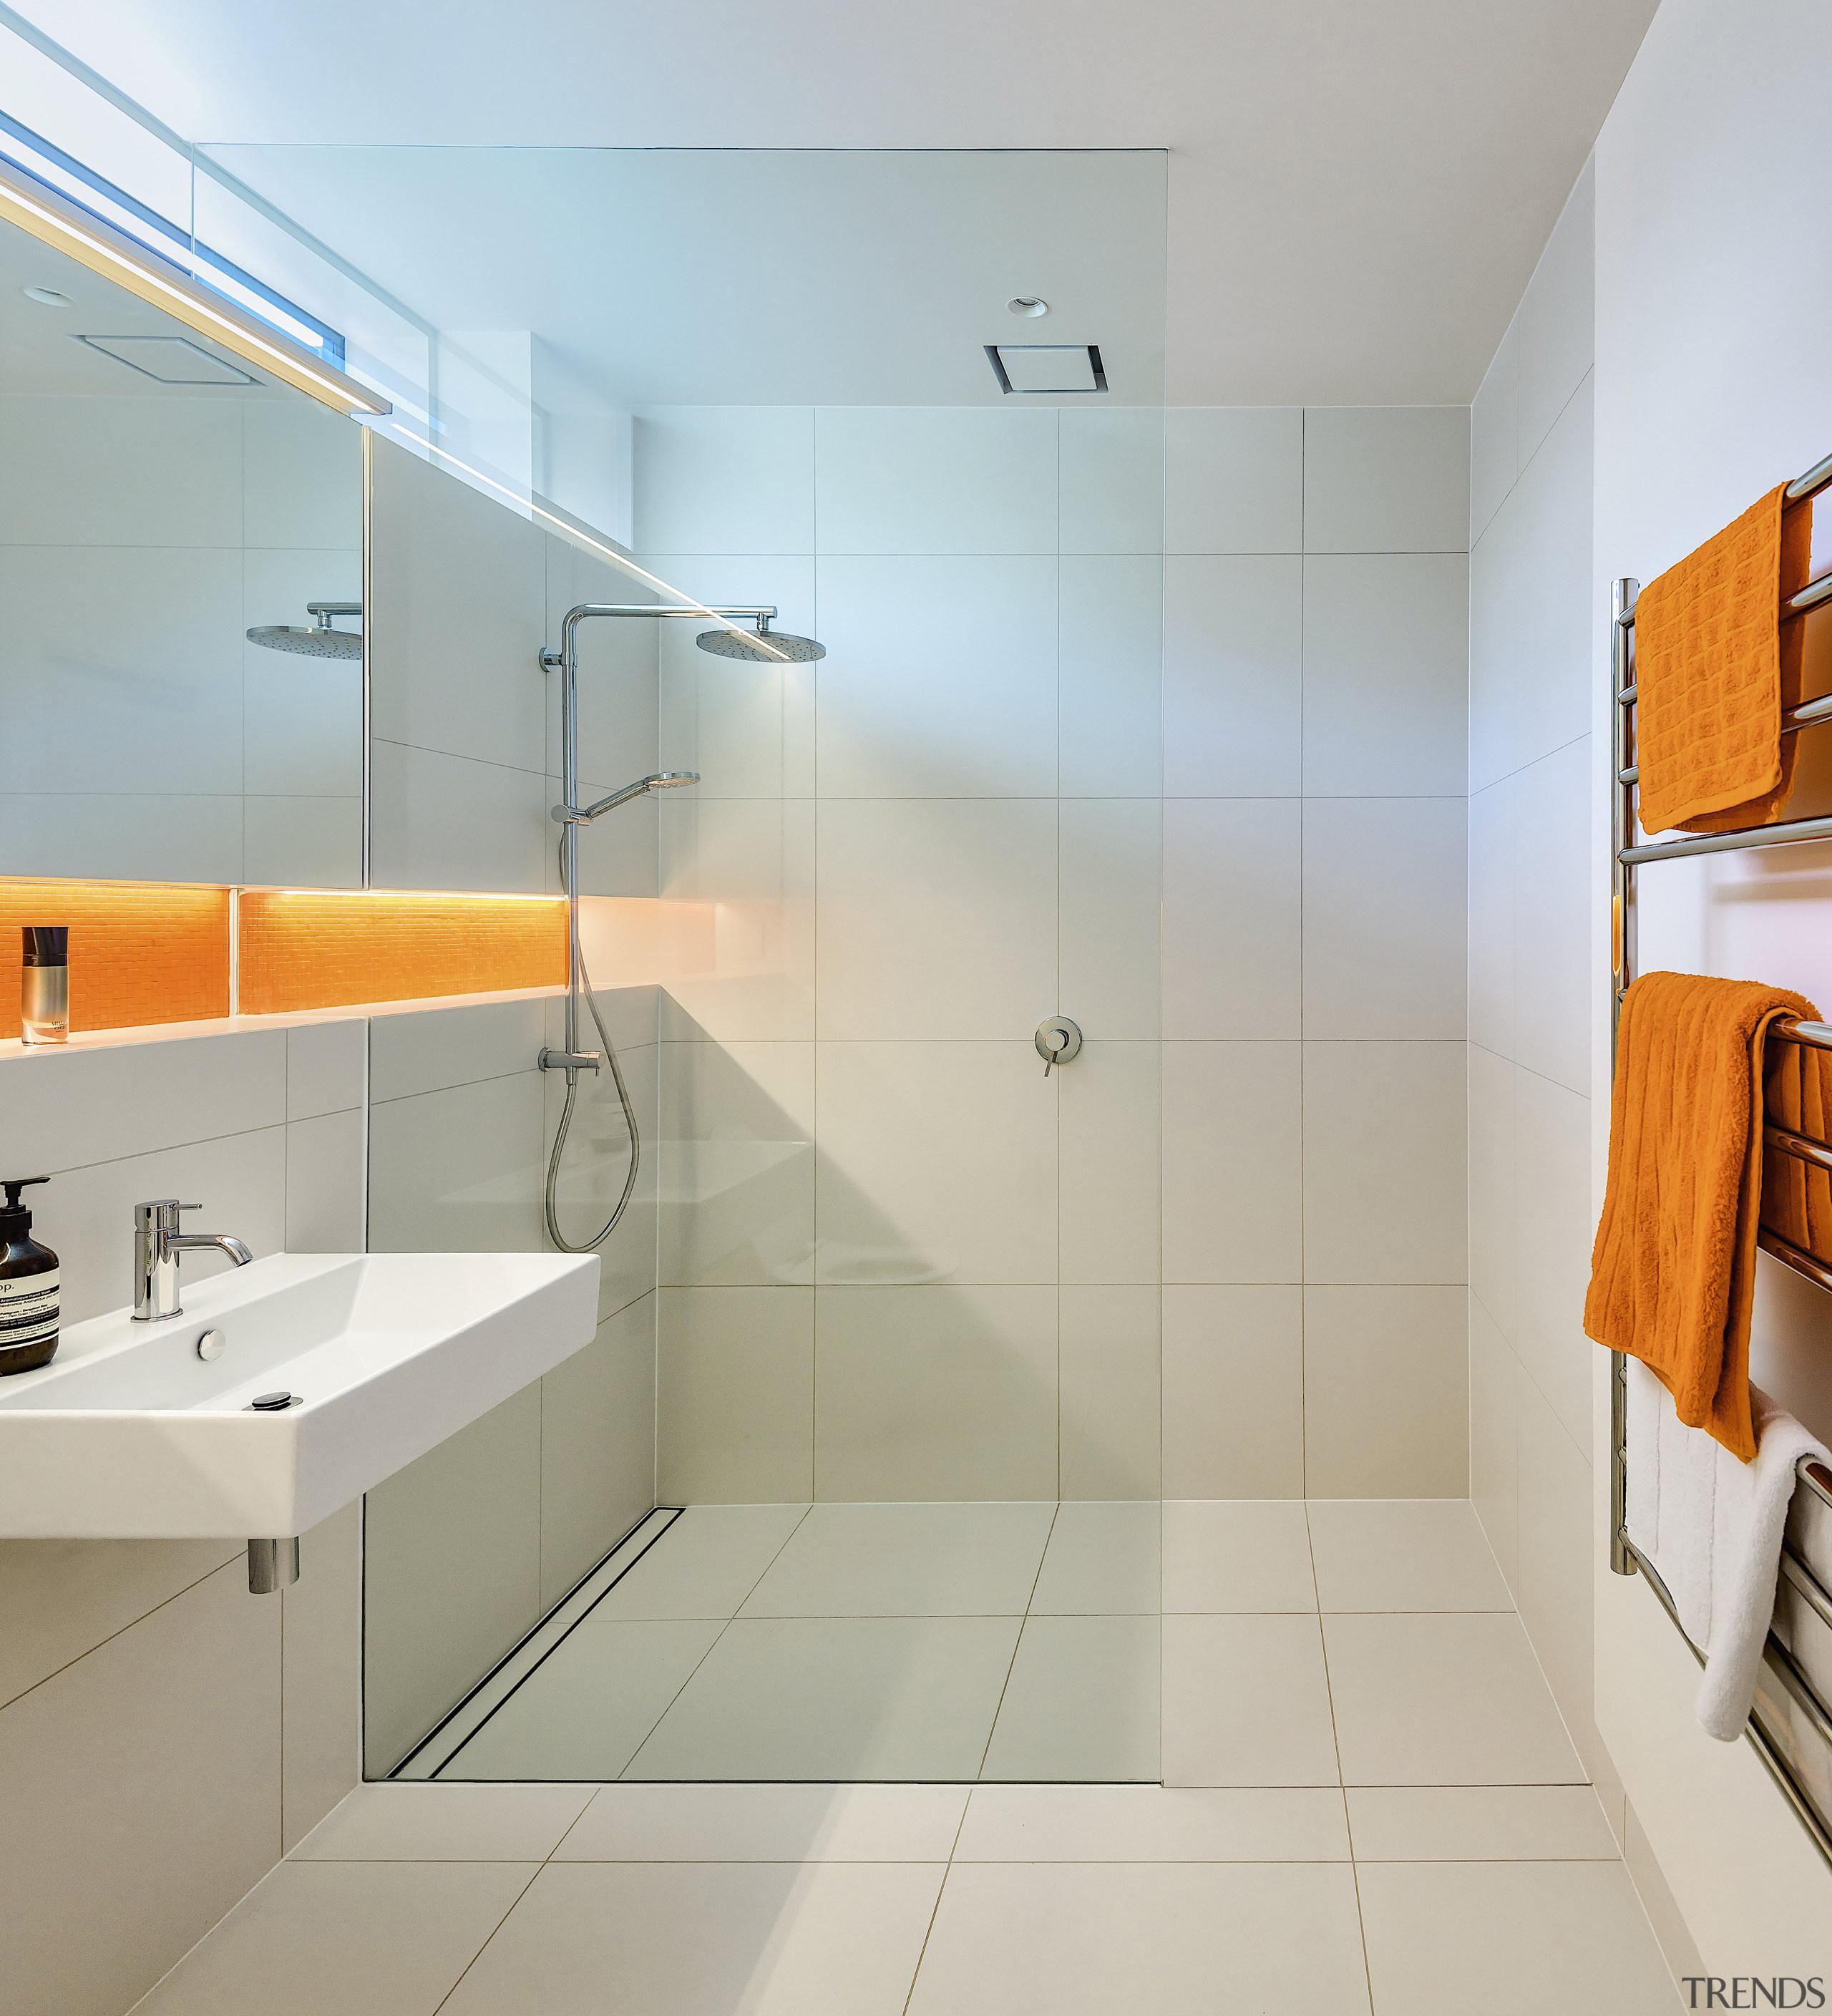 A brilliant strip of orange mosaic tiles add